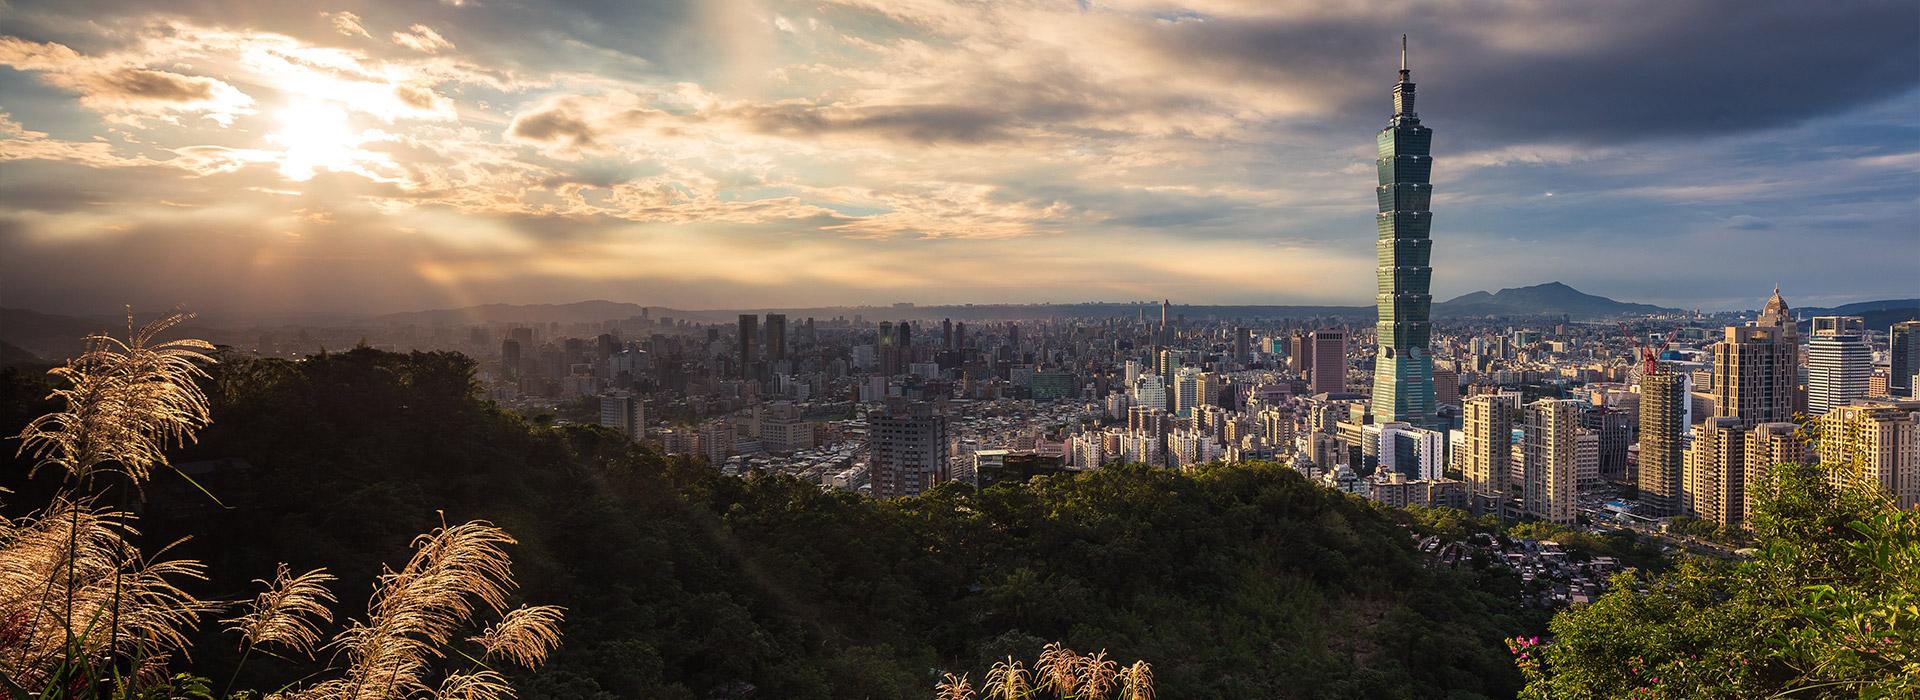 Reisen nach Taiwan - Individuelle Reisen nach Taiwan - Harry Kolb AG - Tourismus